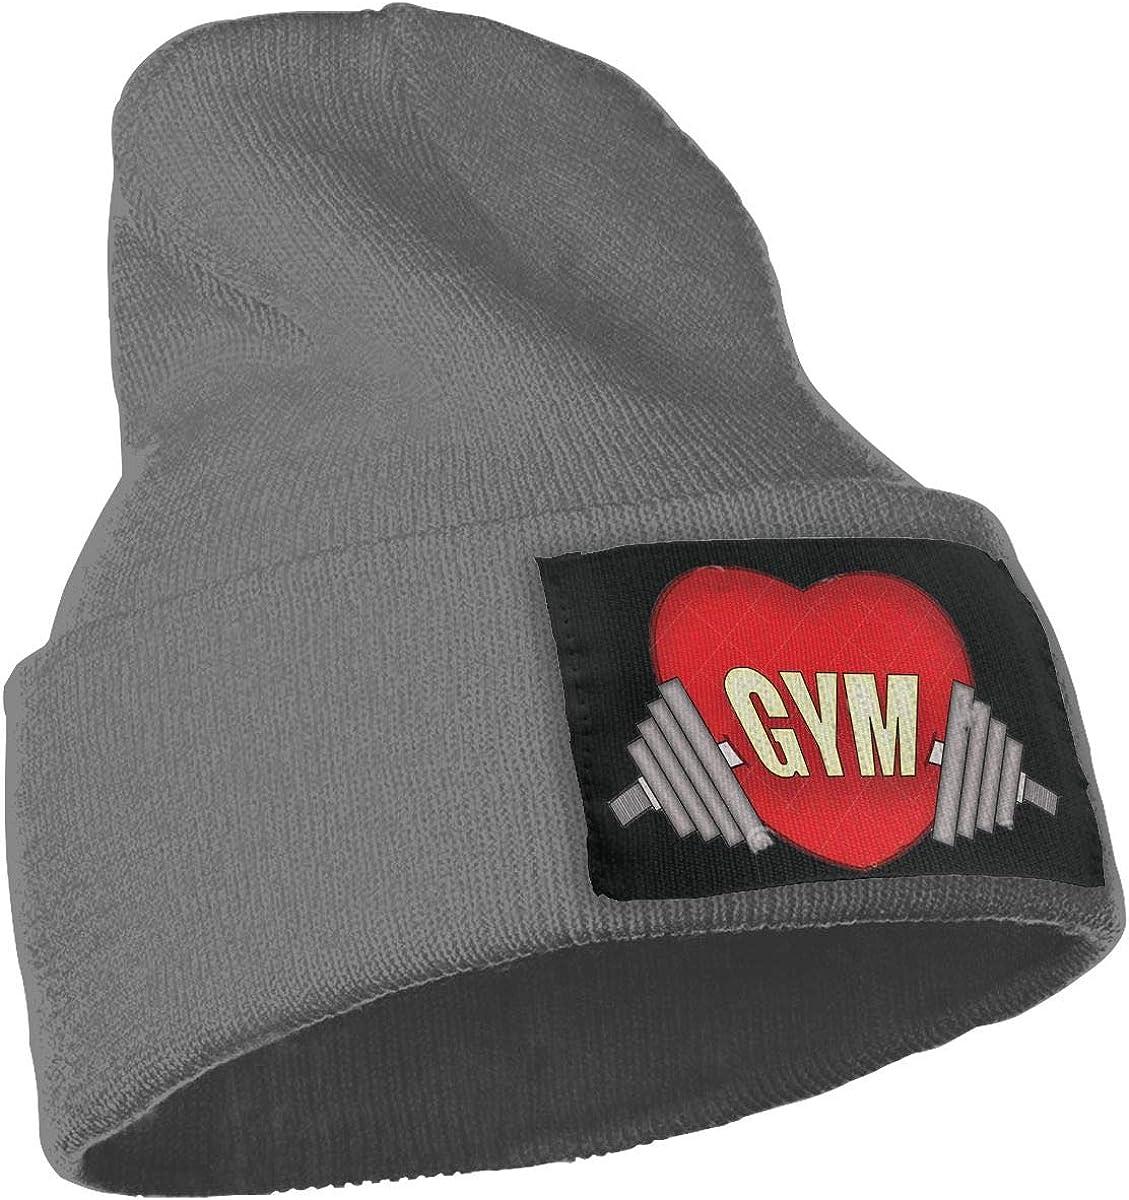 SLADDD1 Gym Heart Warm Winter Hat Knit Beanie Skull Cap Cuff Beanie Hat Winter Hats for Men /& Women